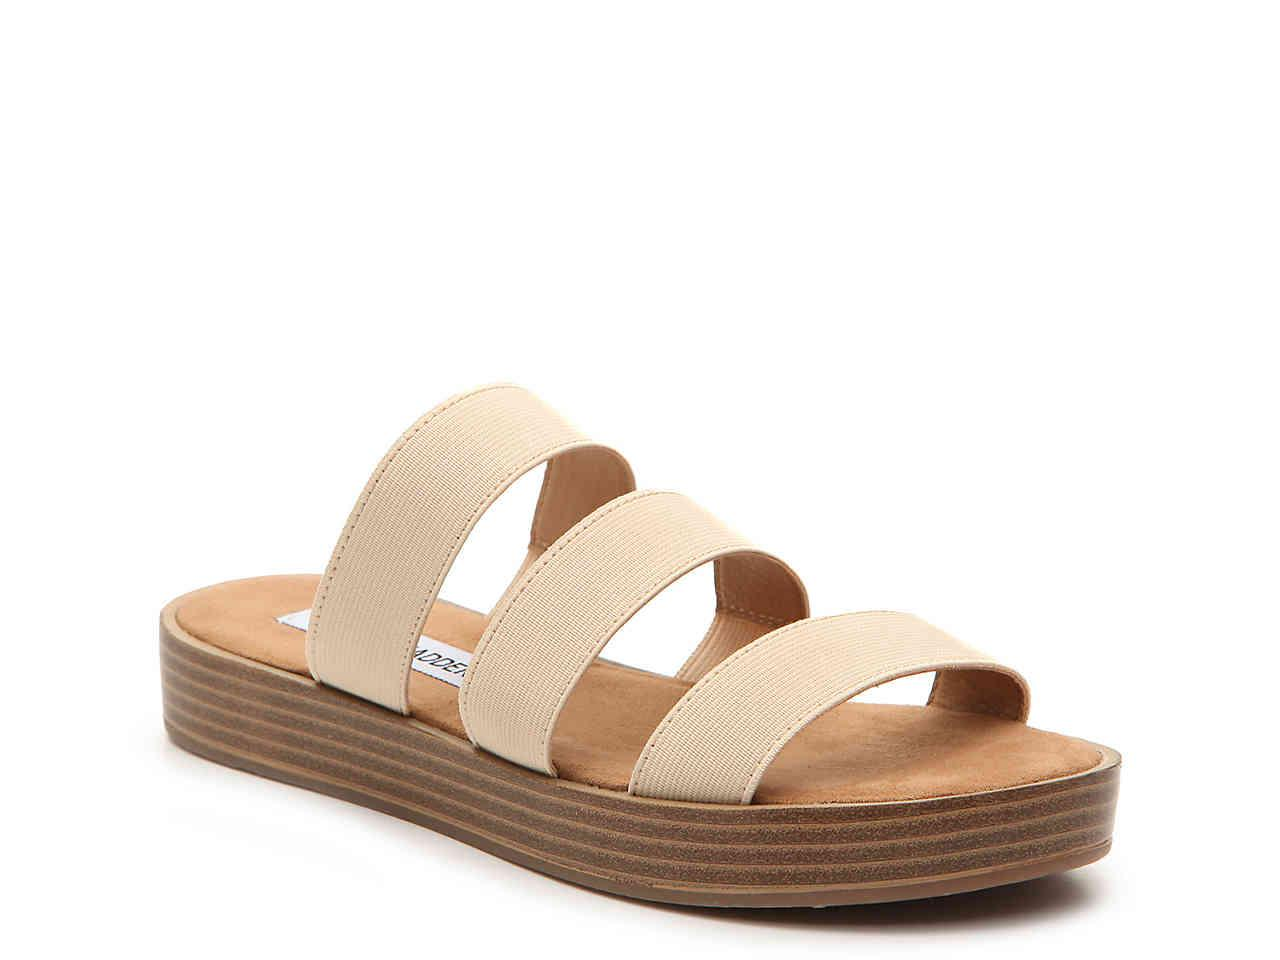 653d0e0d869 Women's Natural Glyn 3 Platform Sandal